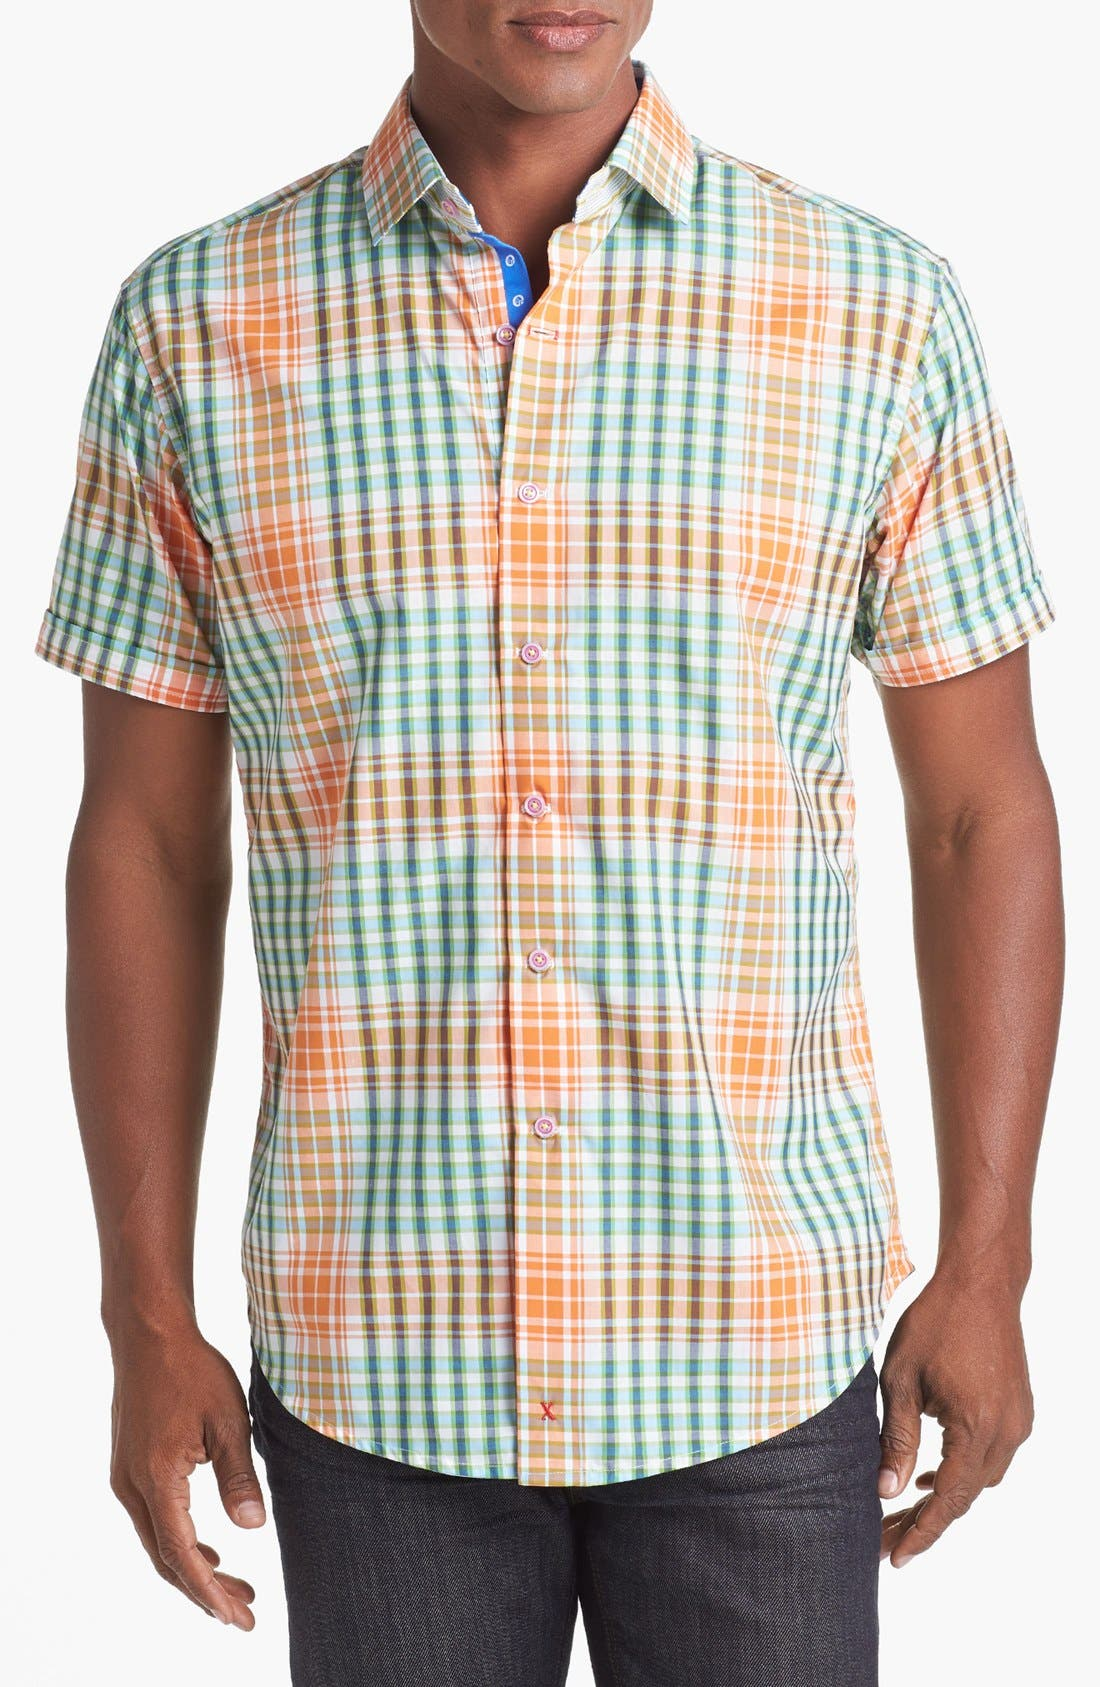 Alternate Image 1 Selected - Robert Graham 'Metro' Short Sleeve Sport Shirt